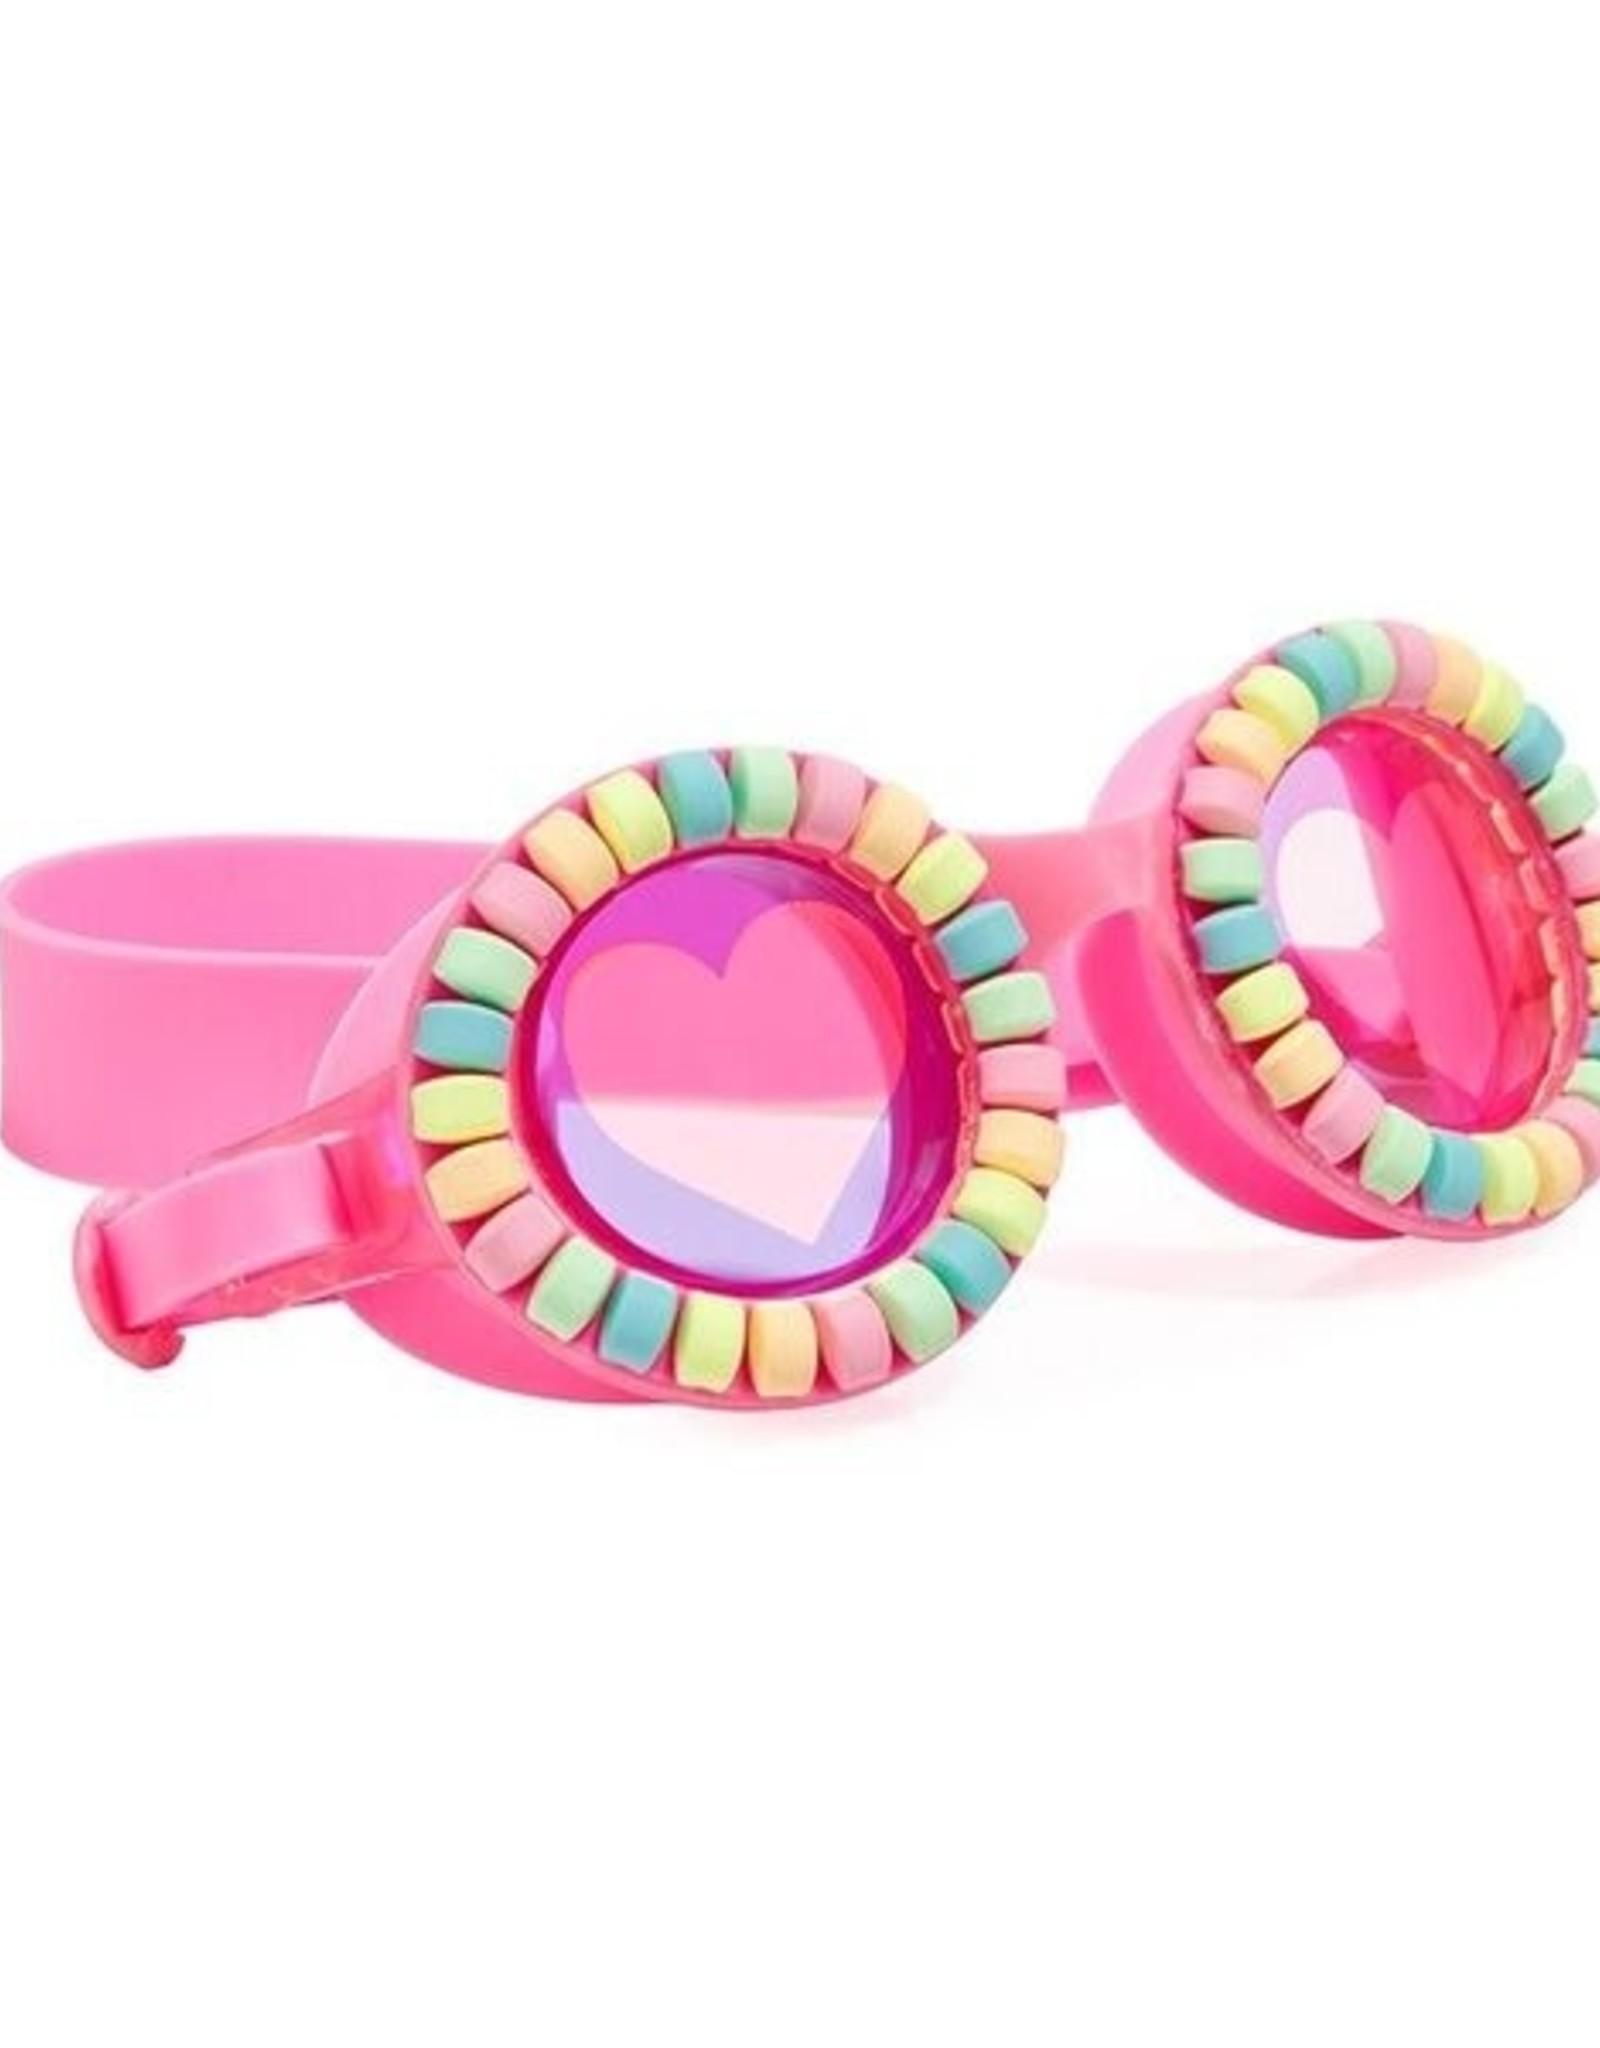 Bling2o Pool Jewel Goggles